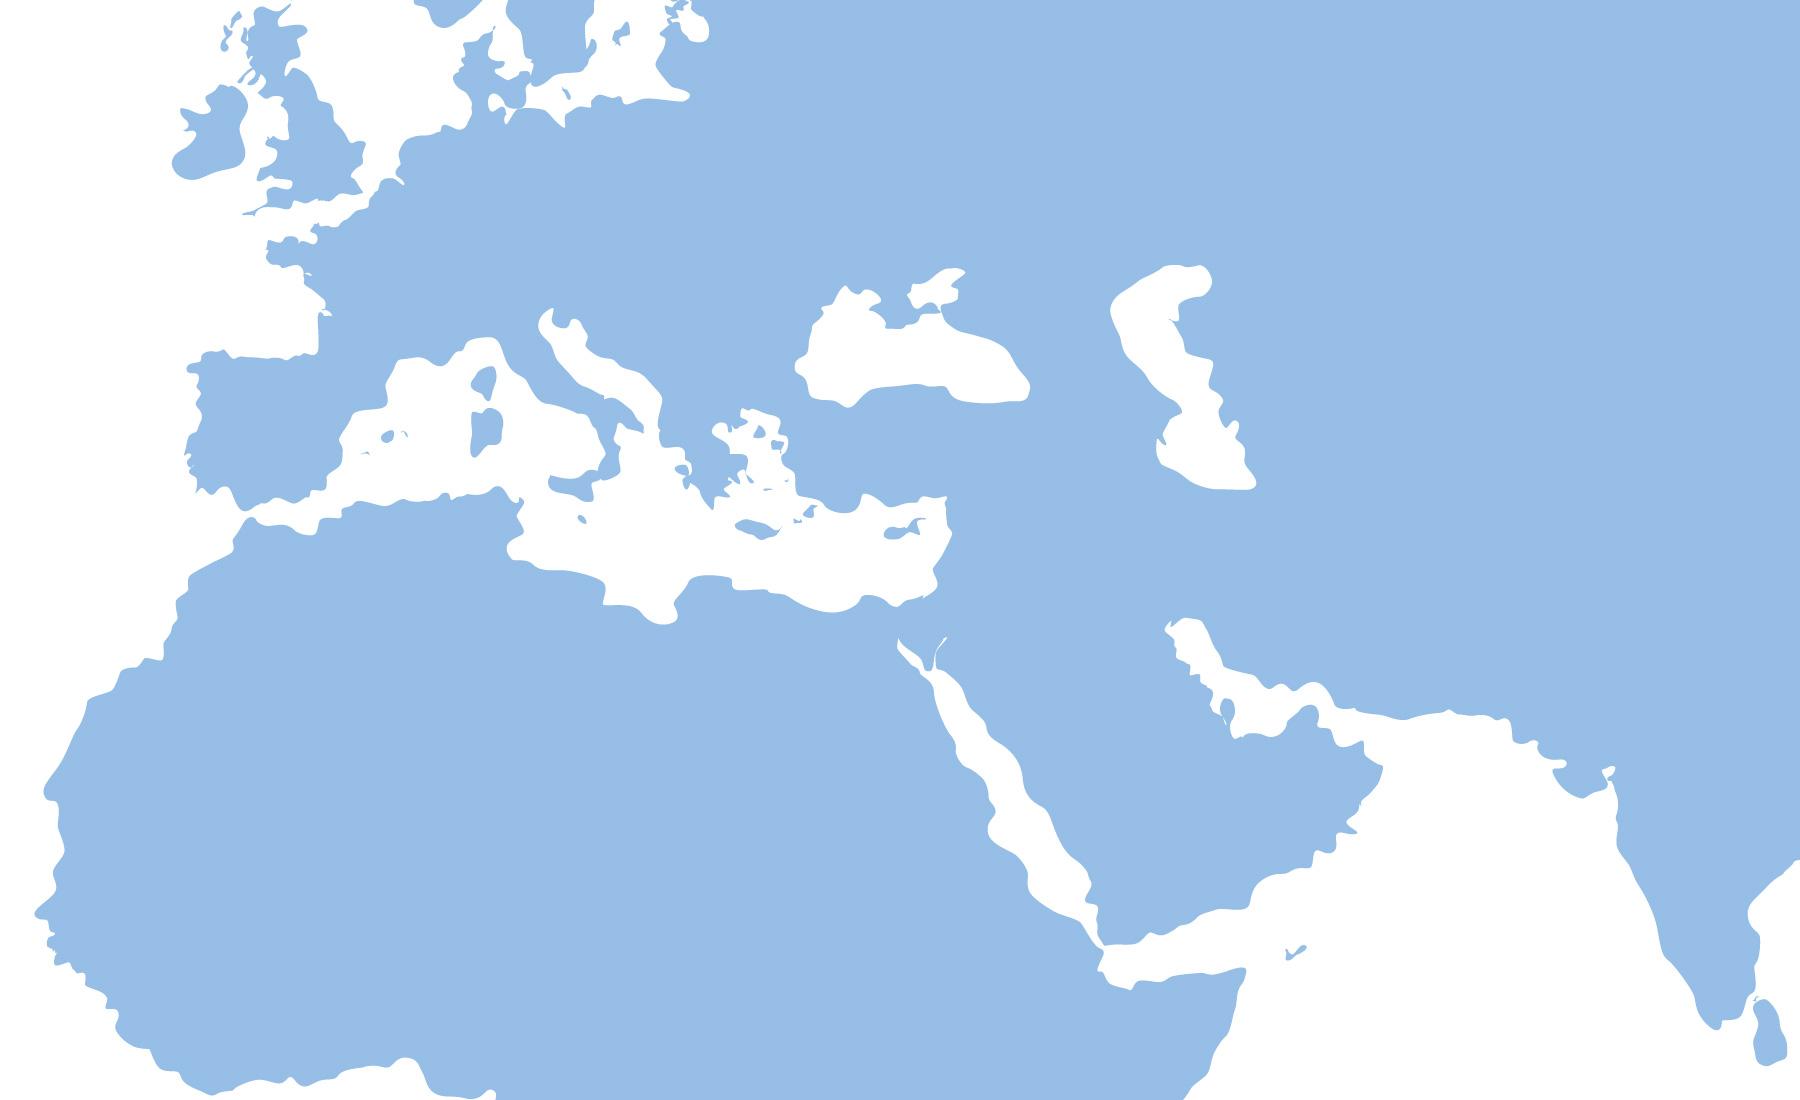 A map of the Mediterranean region